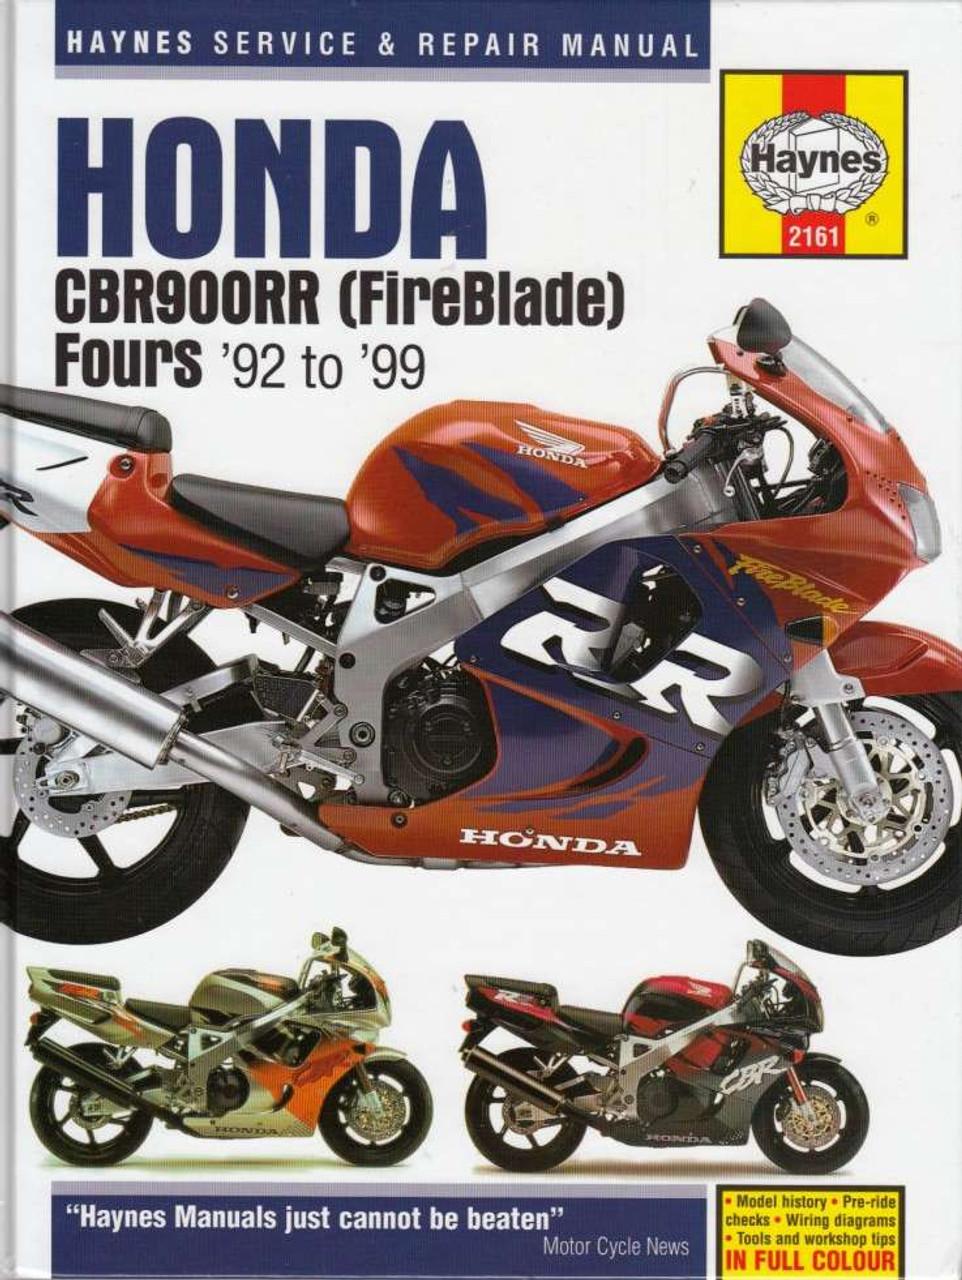 honda cbr900rr fireblade fours 1992 1999 workshop manual  92 cbr900rr wiring diagram #8